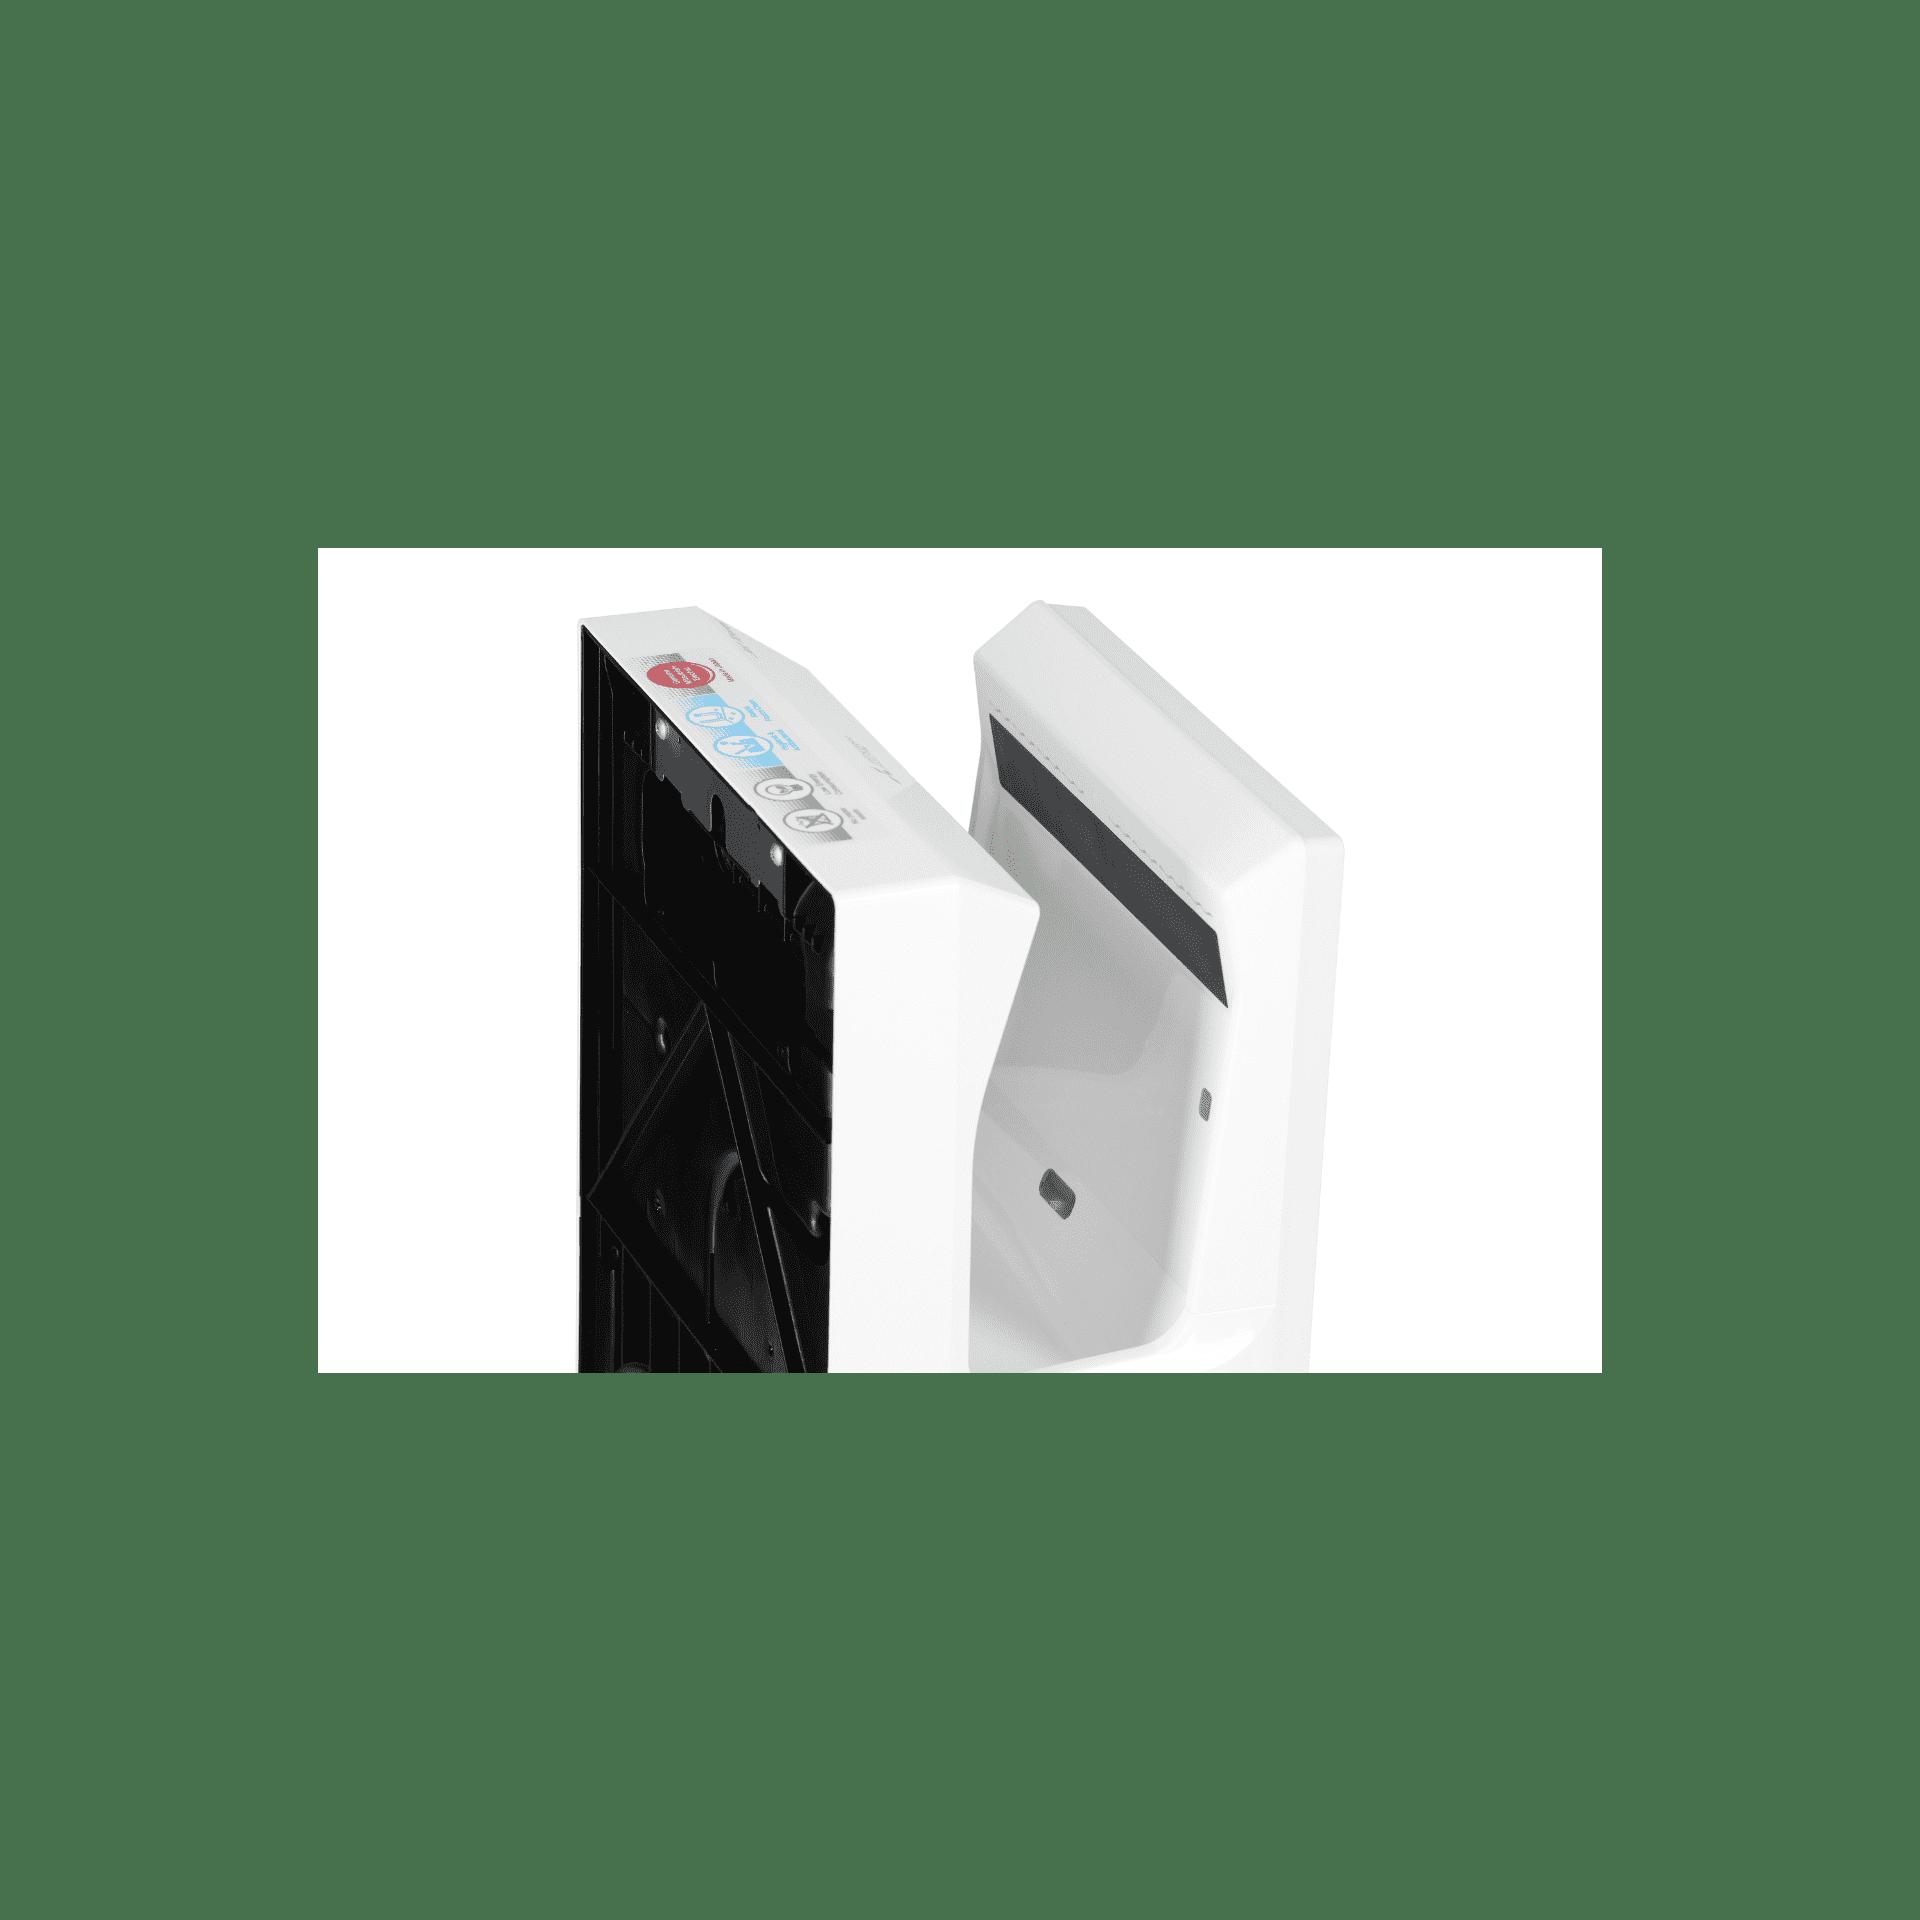 jet blade uv mitsubishi dryer air from bremmer handsinhanddryer dryers driers blades hands hand in executive